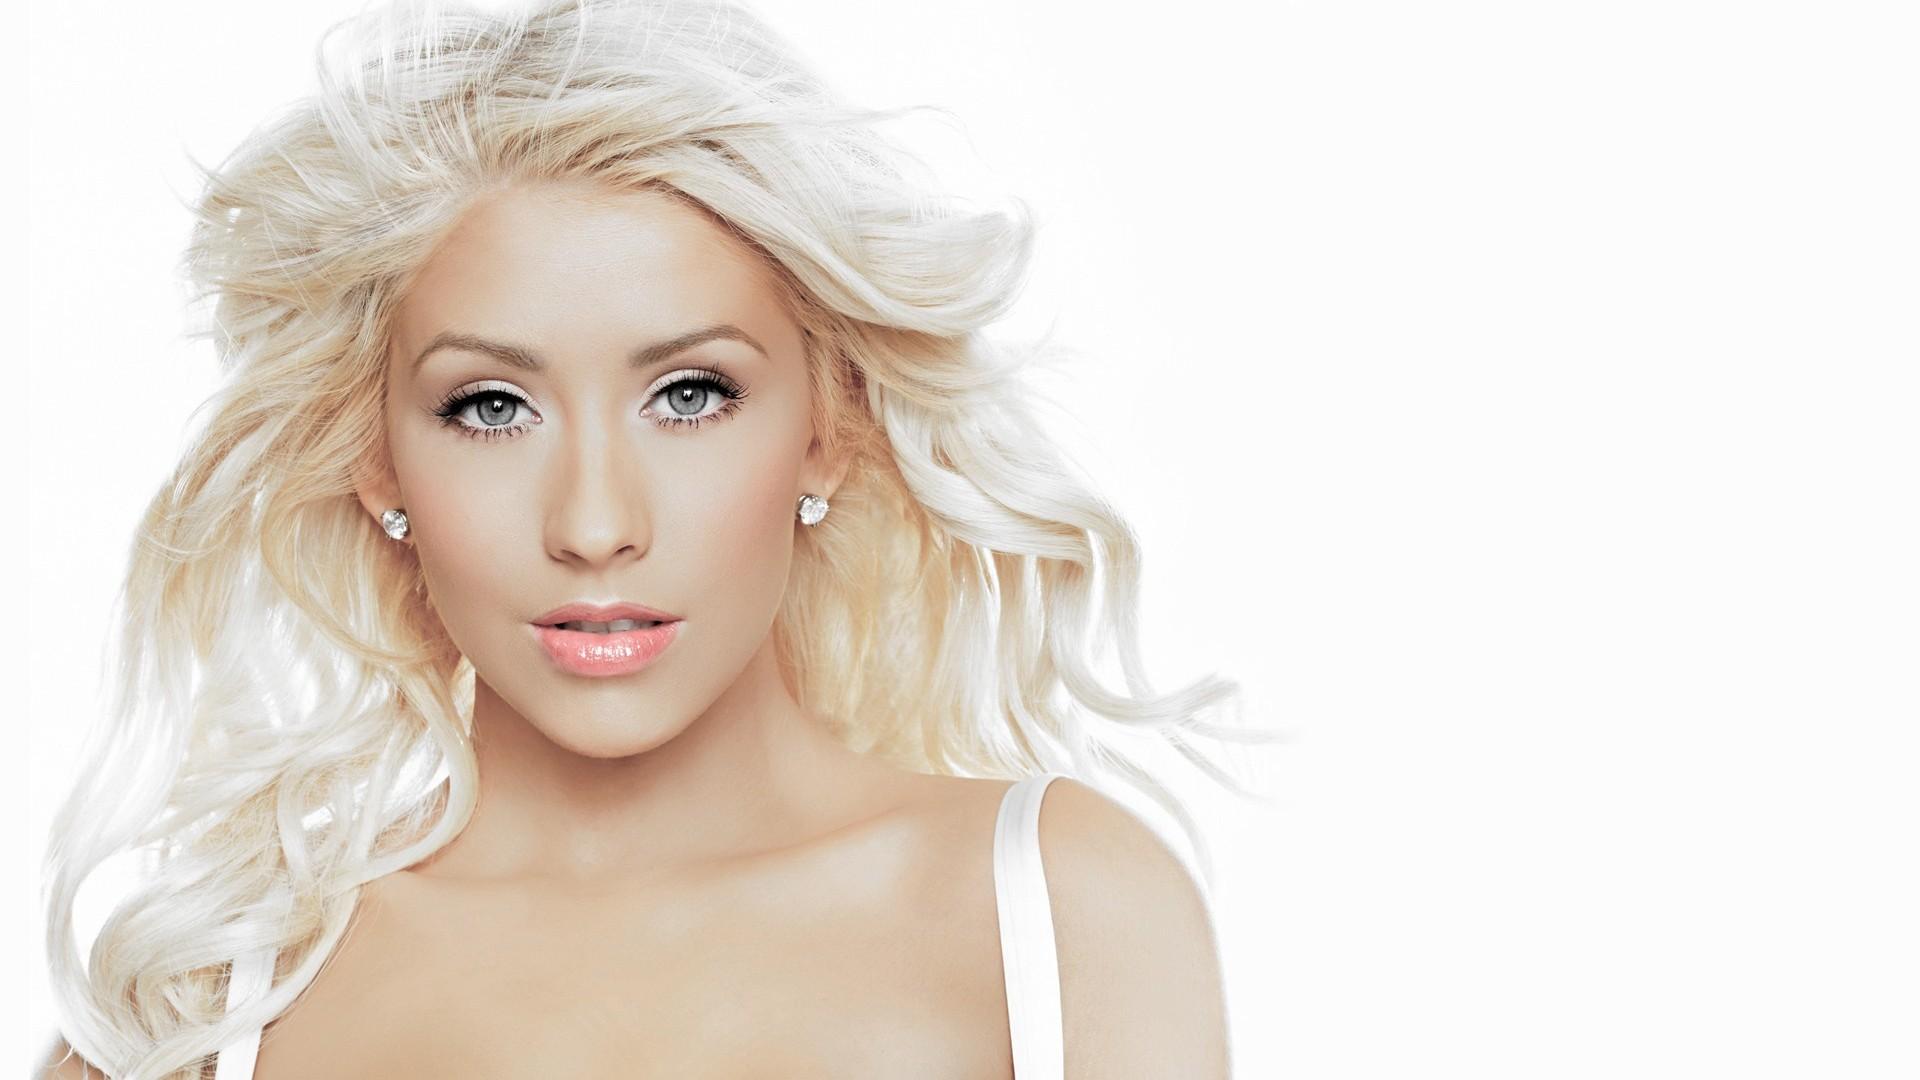 Christina Aguilera wallpaper 4823 1920x1080